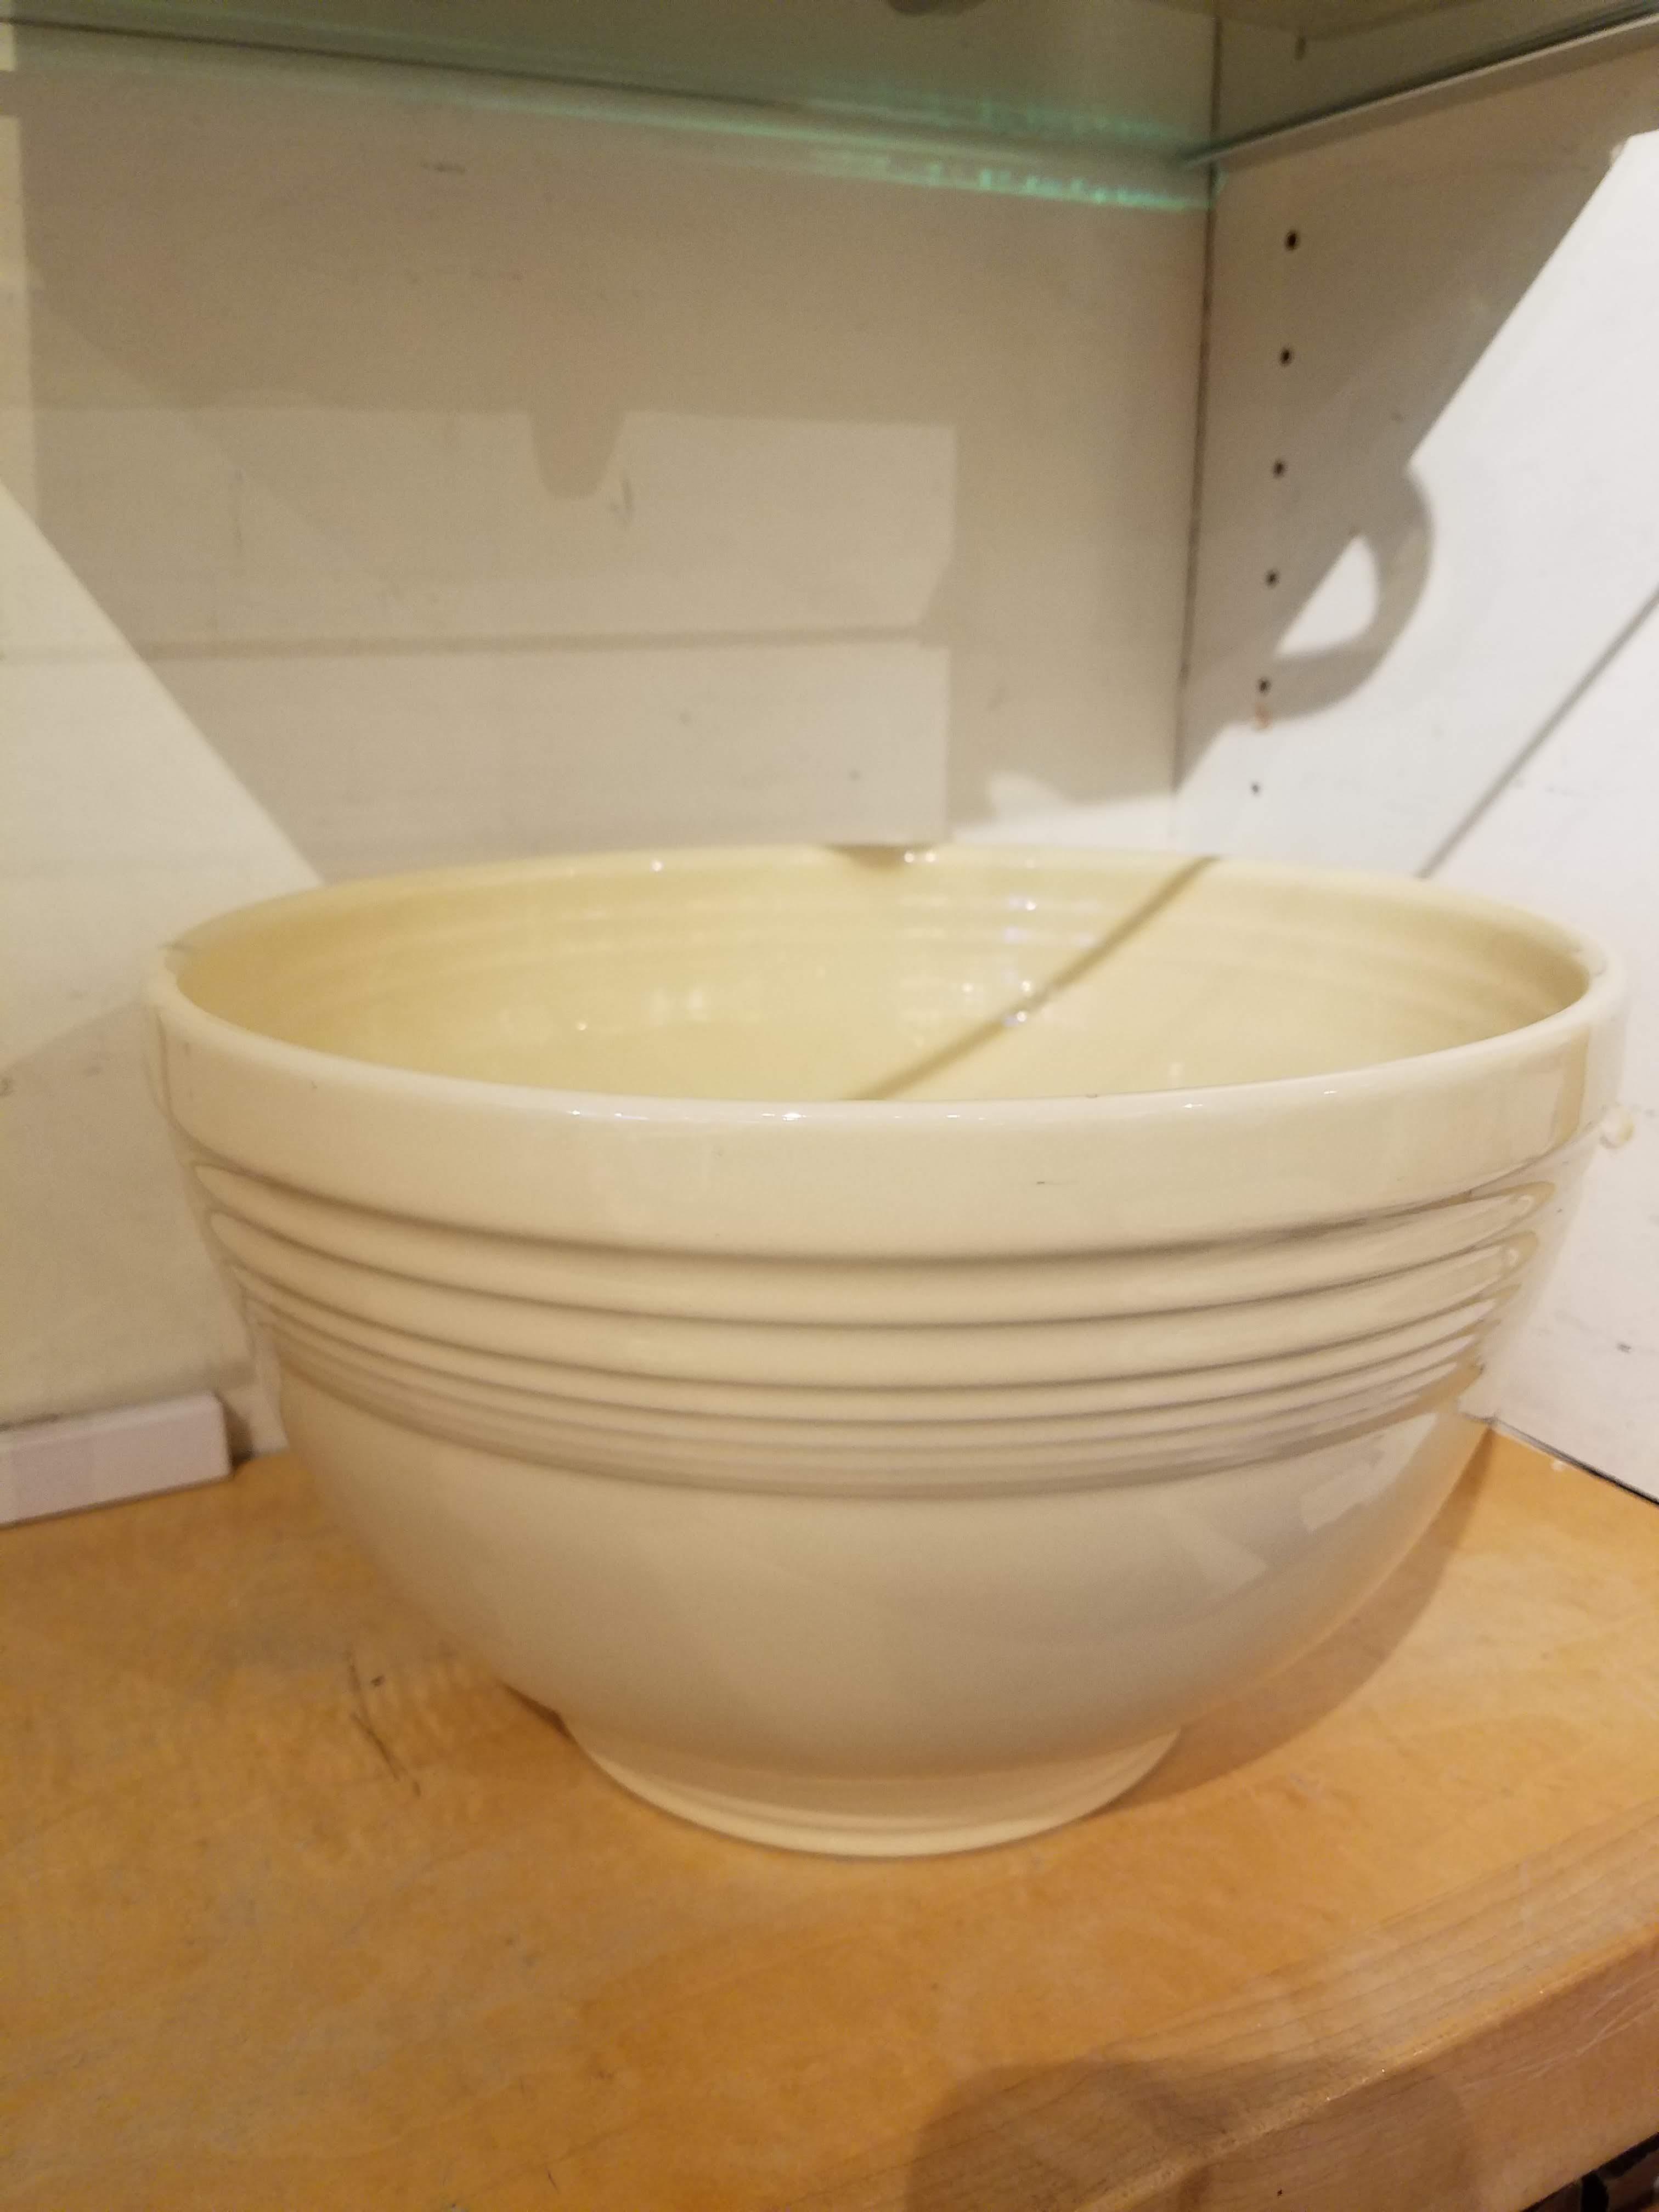 Fiestaware Large Ivory Baking Bowl - Peppercorn